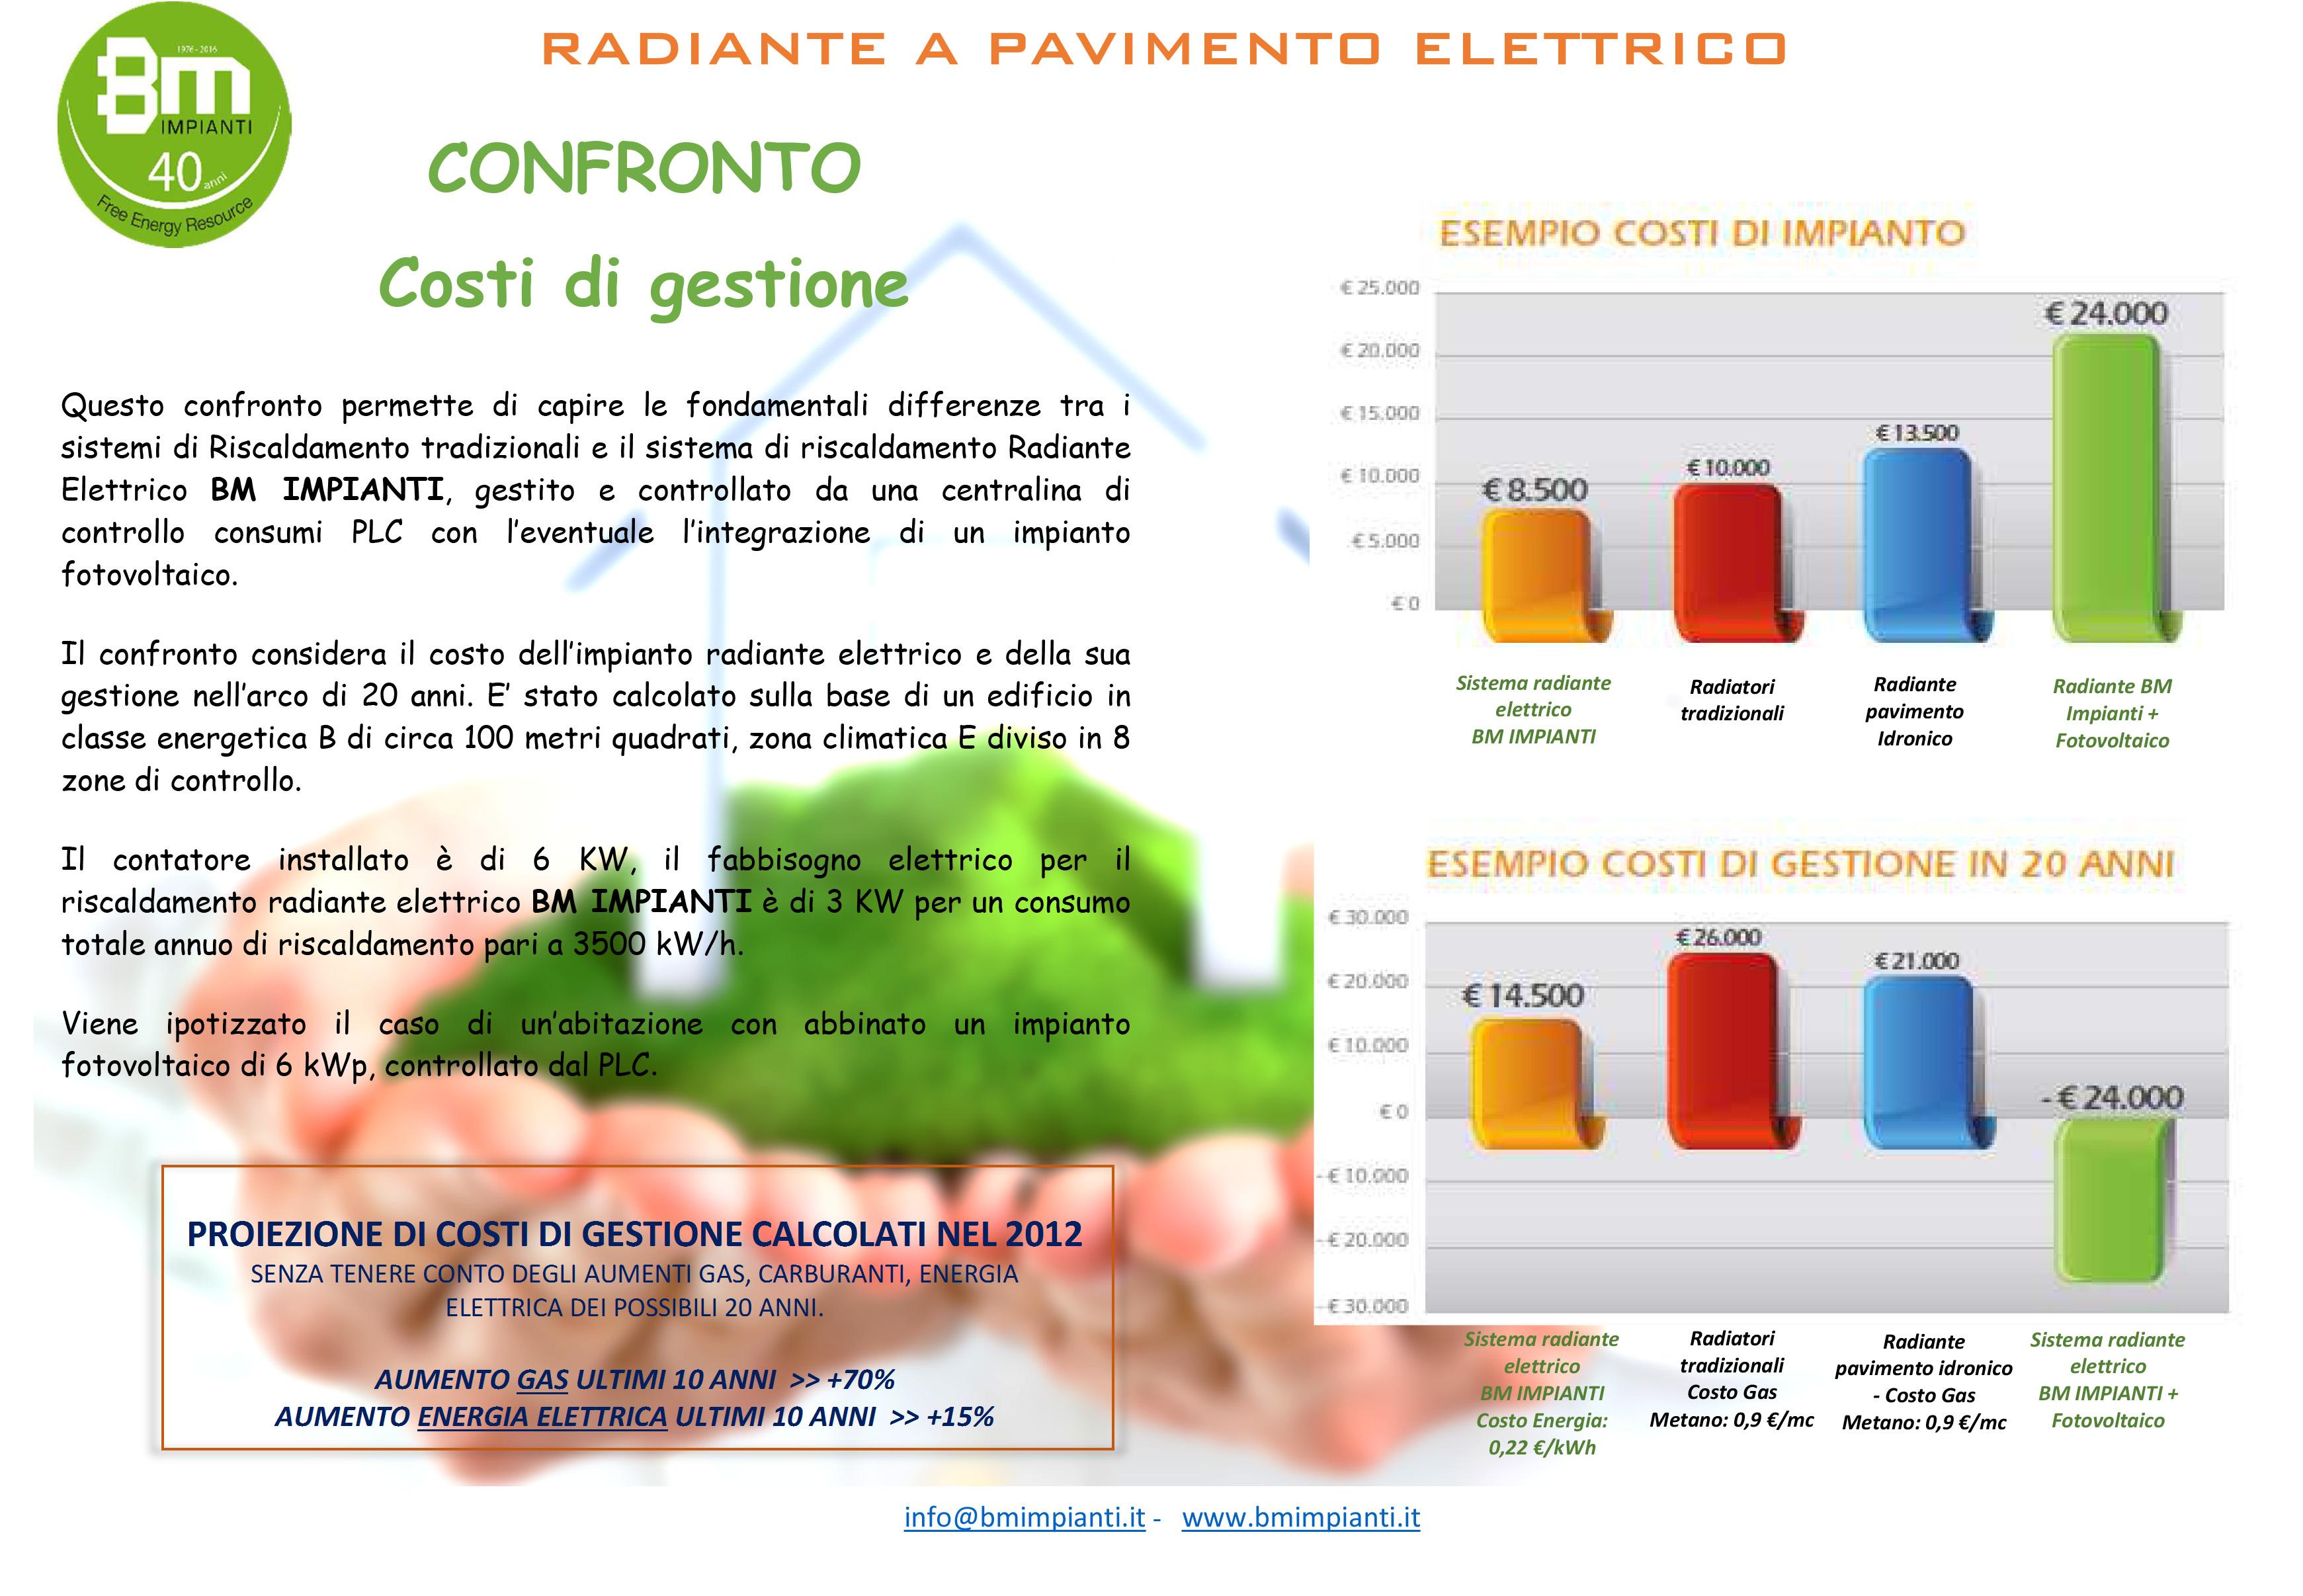 Riscaldamento radiante elettrico a pavimento civile ed industriale - BM ImpiantiBM Impianti